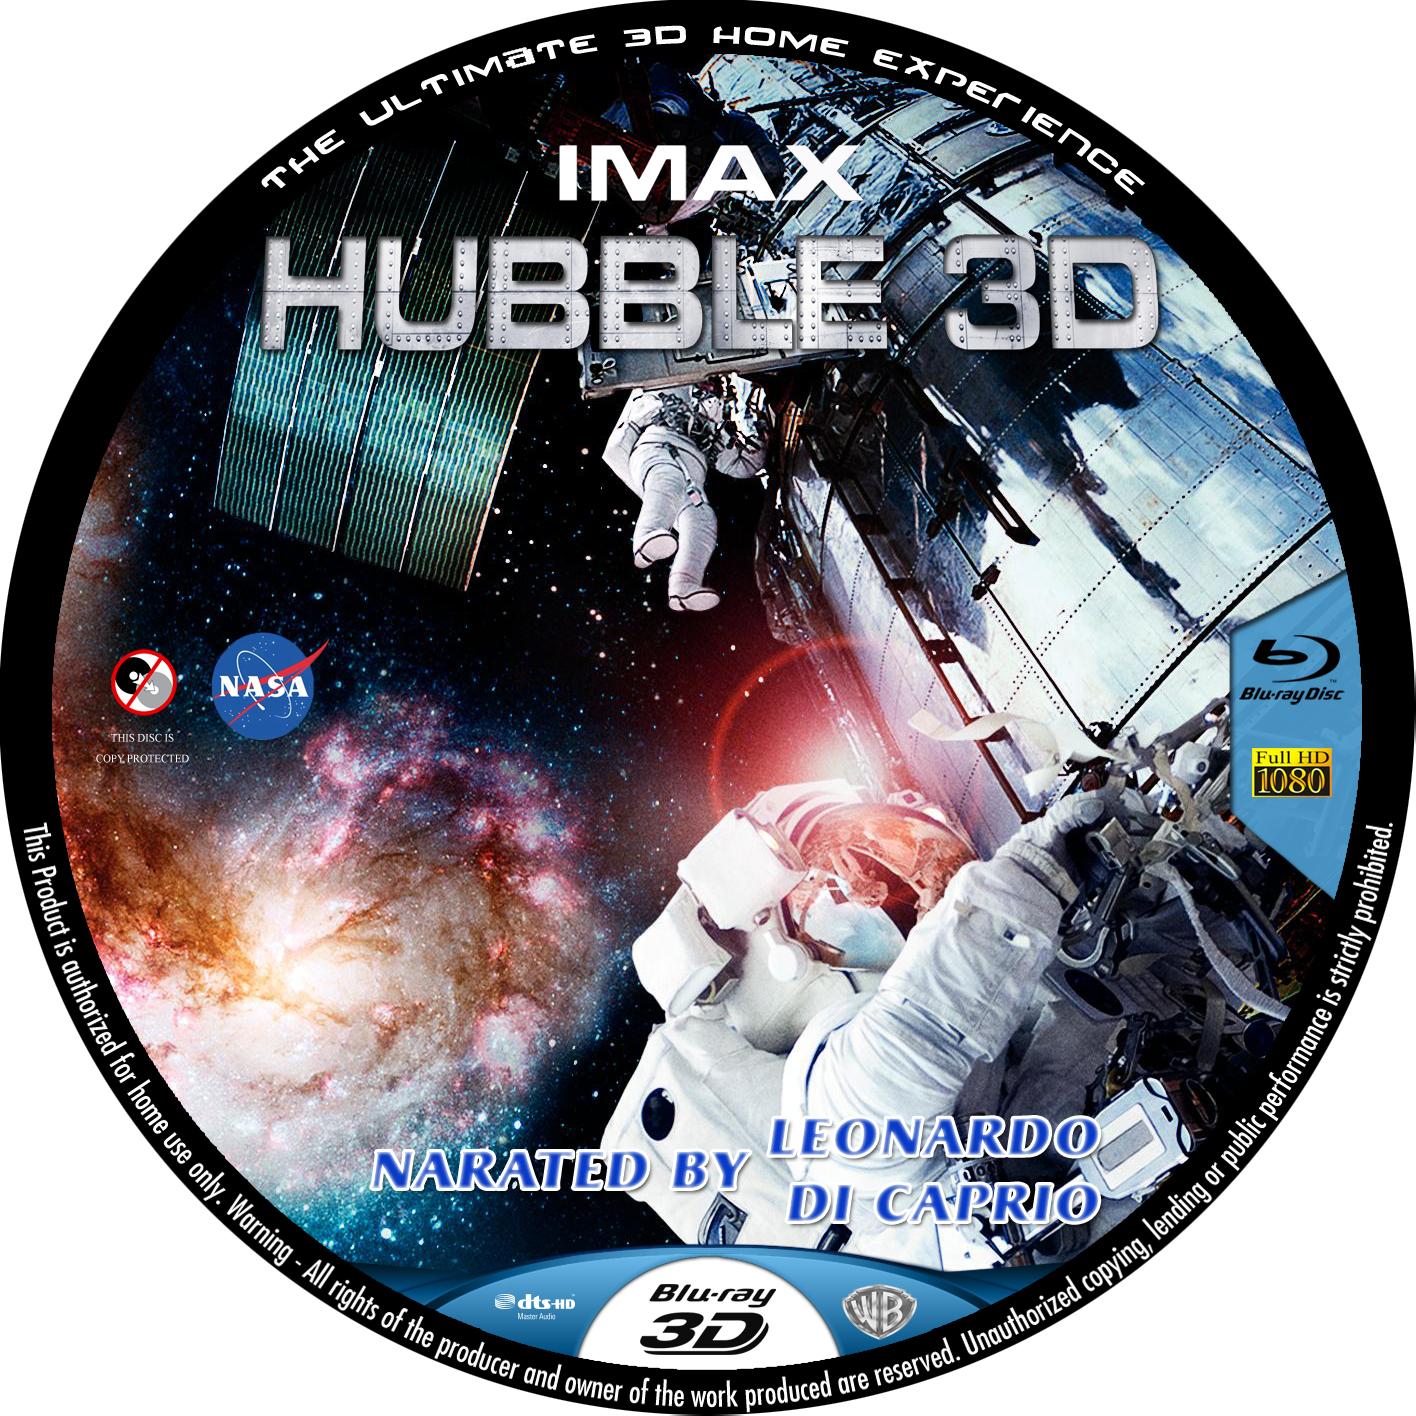 New-rutororg  телескоп хаббл в 3д  imax hubble 3d